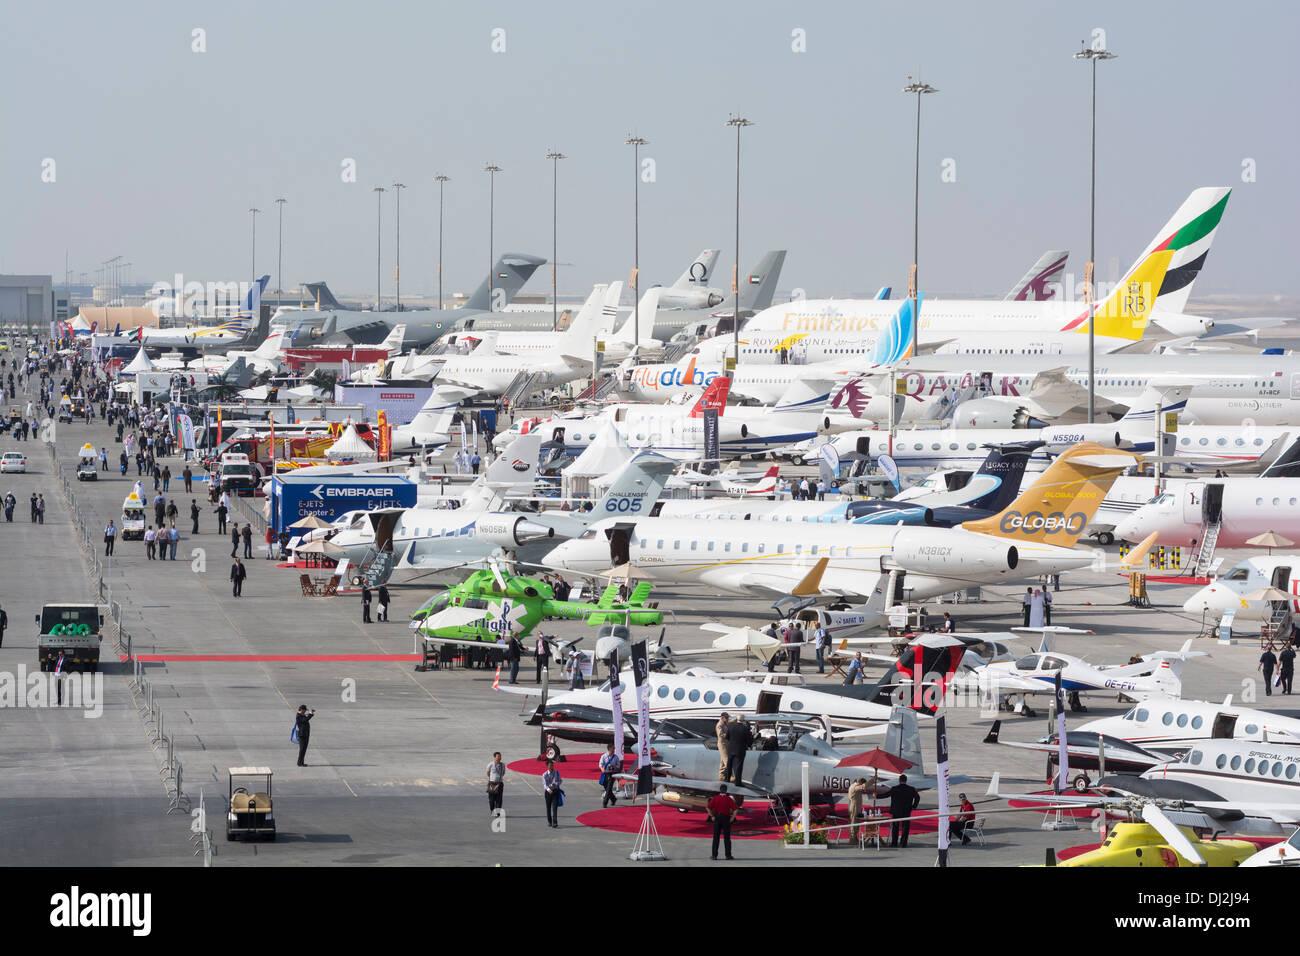 Many aircraft on apron at Al Maktoum International airport during Dubai Airshow 2013 in United Arab Emirates - Stock Image